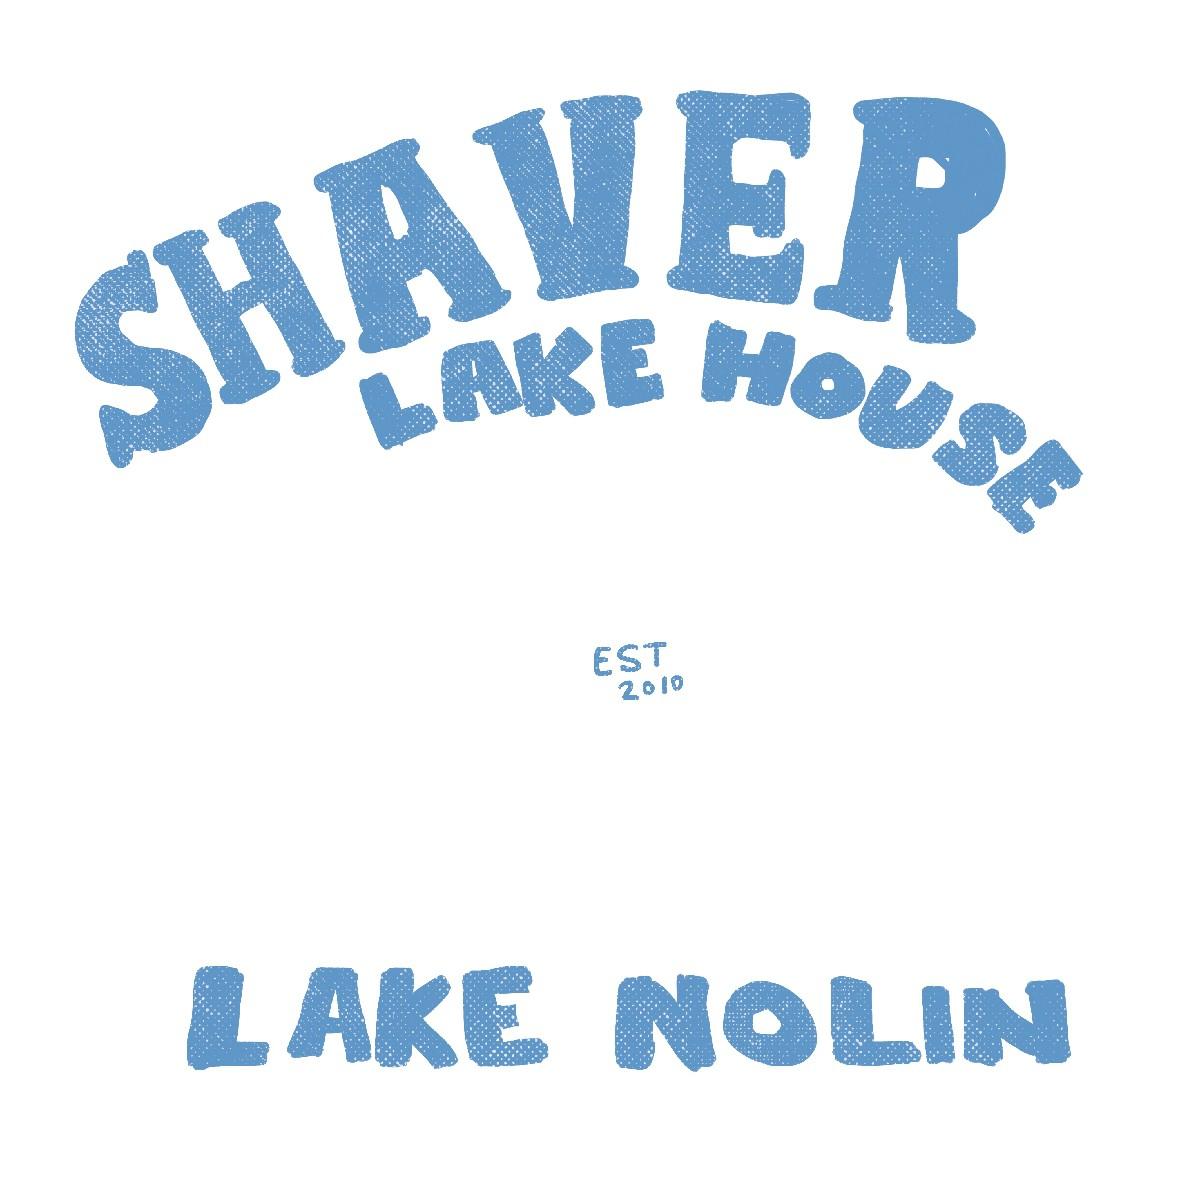 Shaver Lake House 10 Year Anniversary